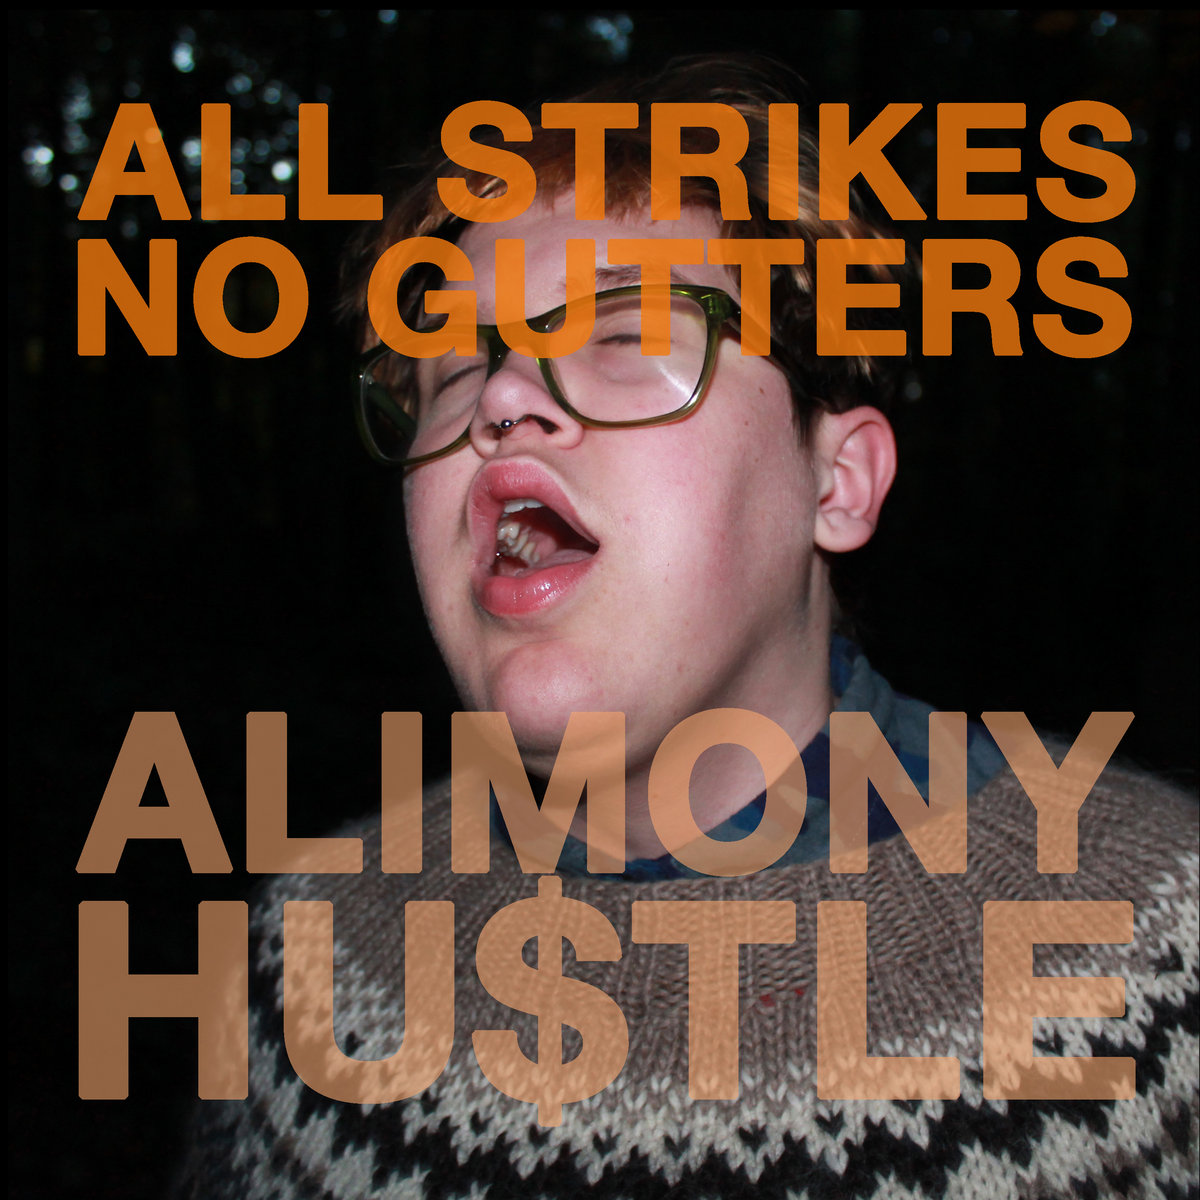 Alimony Hustle